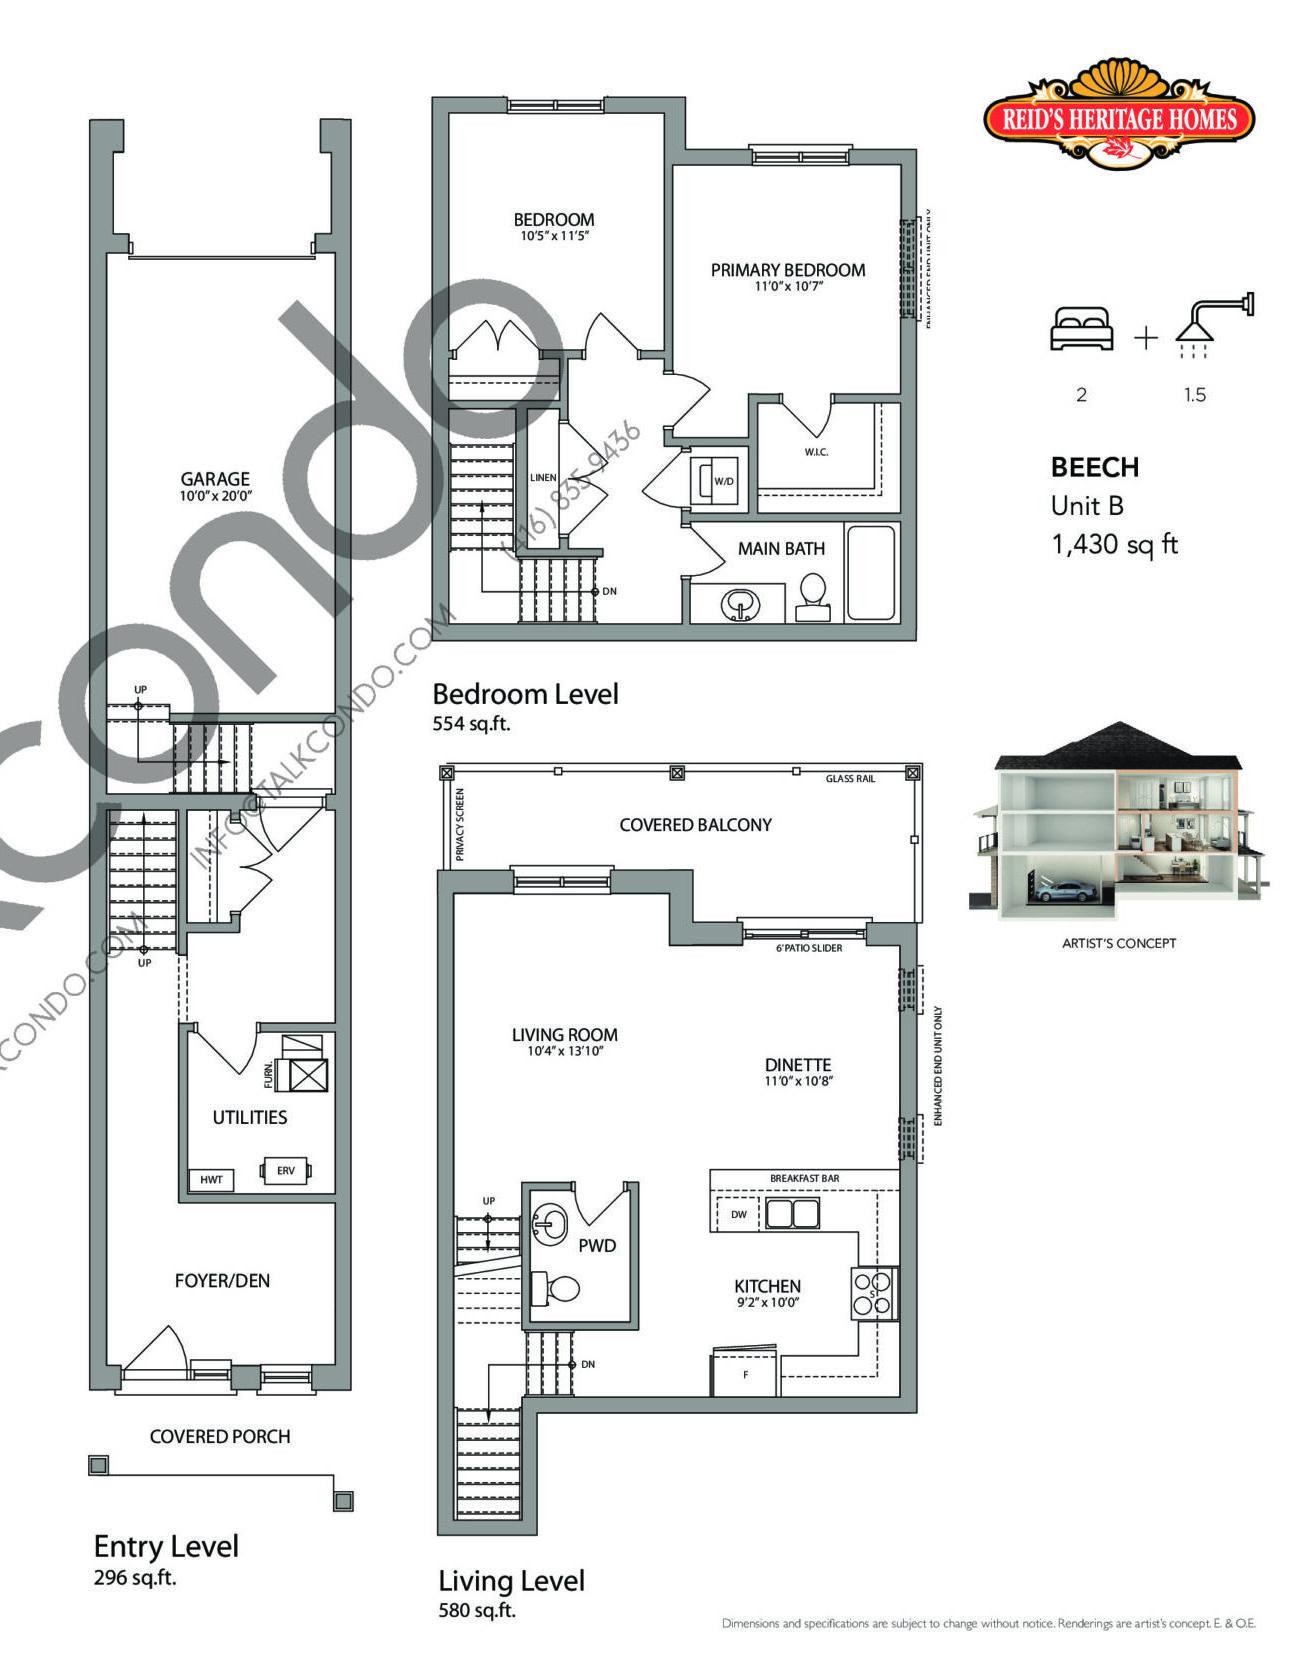 Beech (Oakhurst Collection) Floor Plan at West Oak Urban Towns - 1430 sq.ft